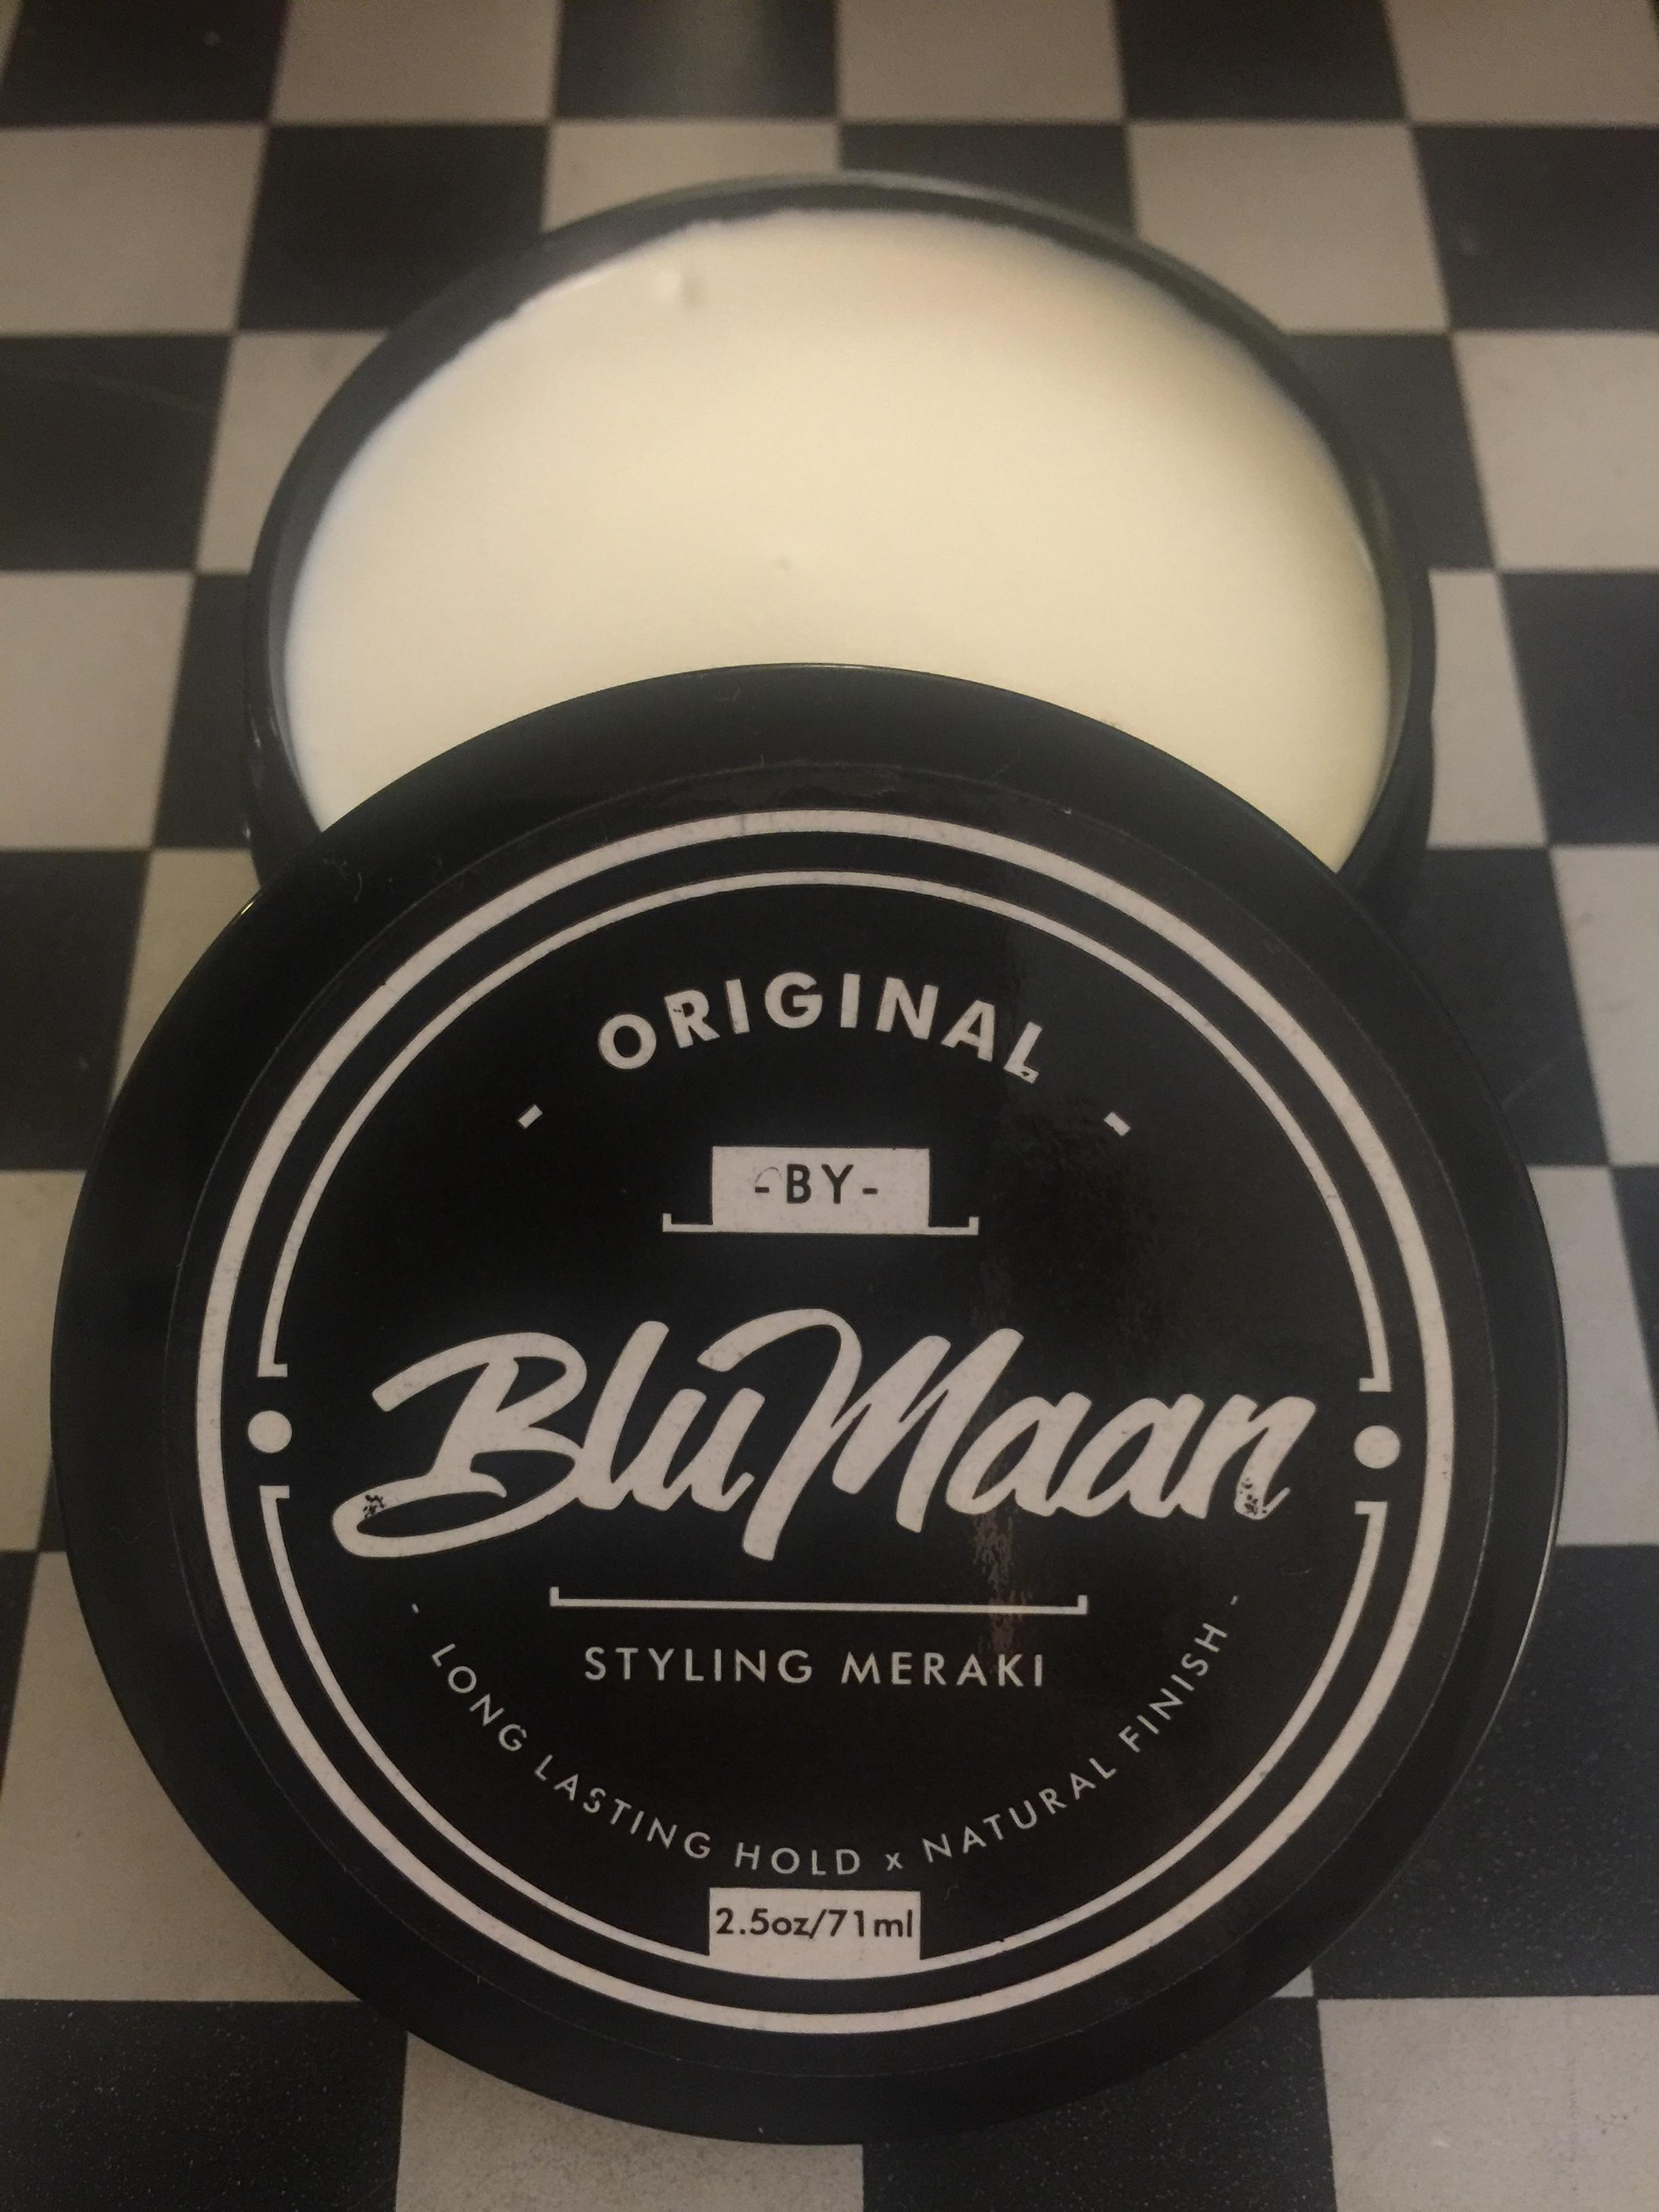 Original by BluMaan – Styling Meraki - Matte Finish (2.5 oz)